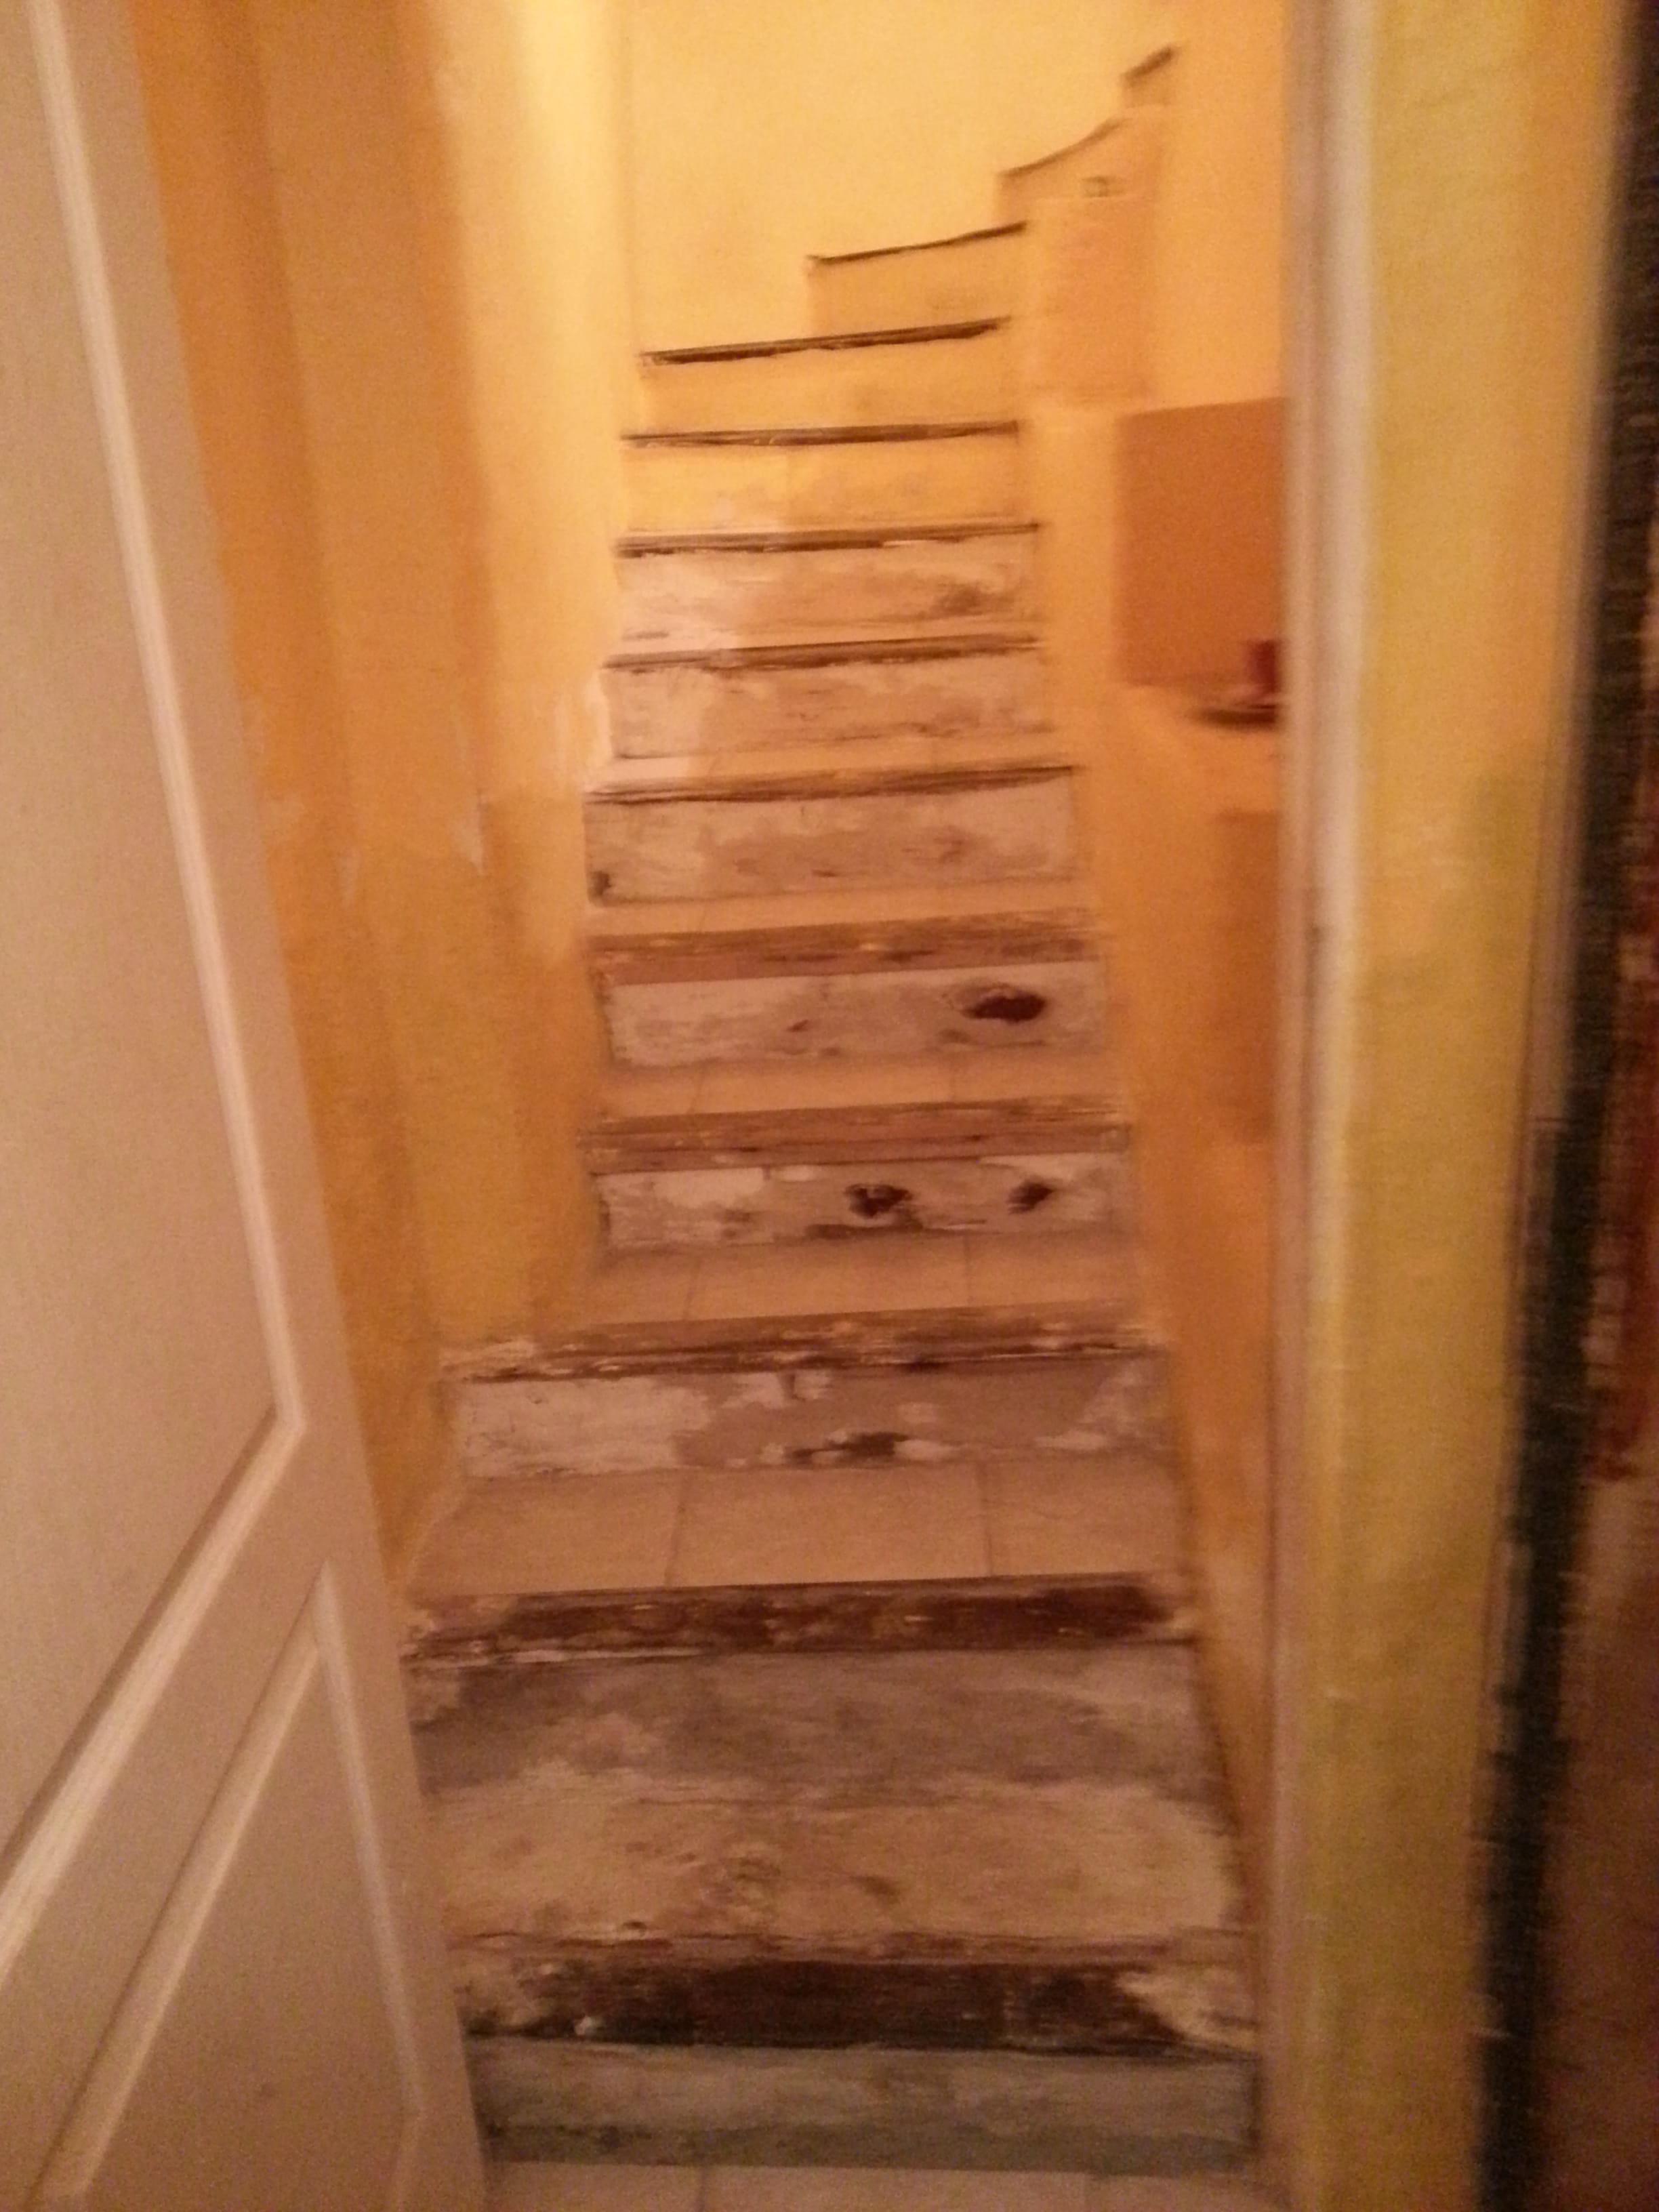 comment renover un escalier en bois ancien id es d coration id es d coration. Black Bedroom Furniture Sets. Home Design Ideas